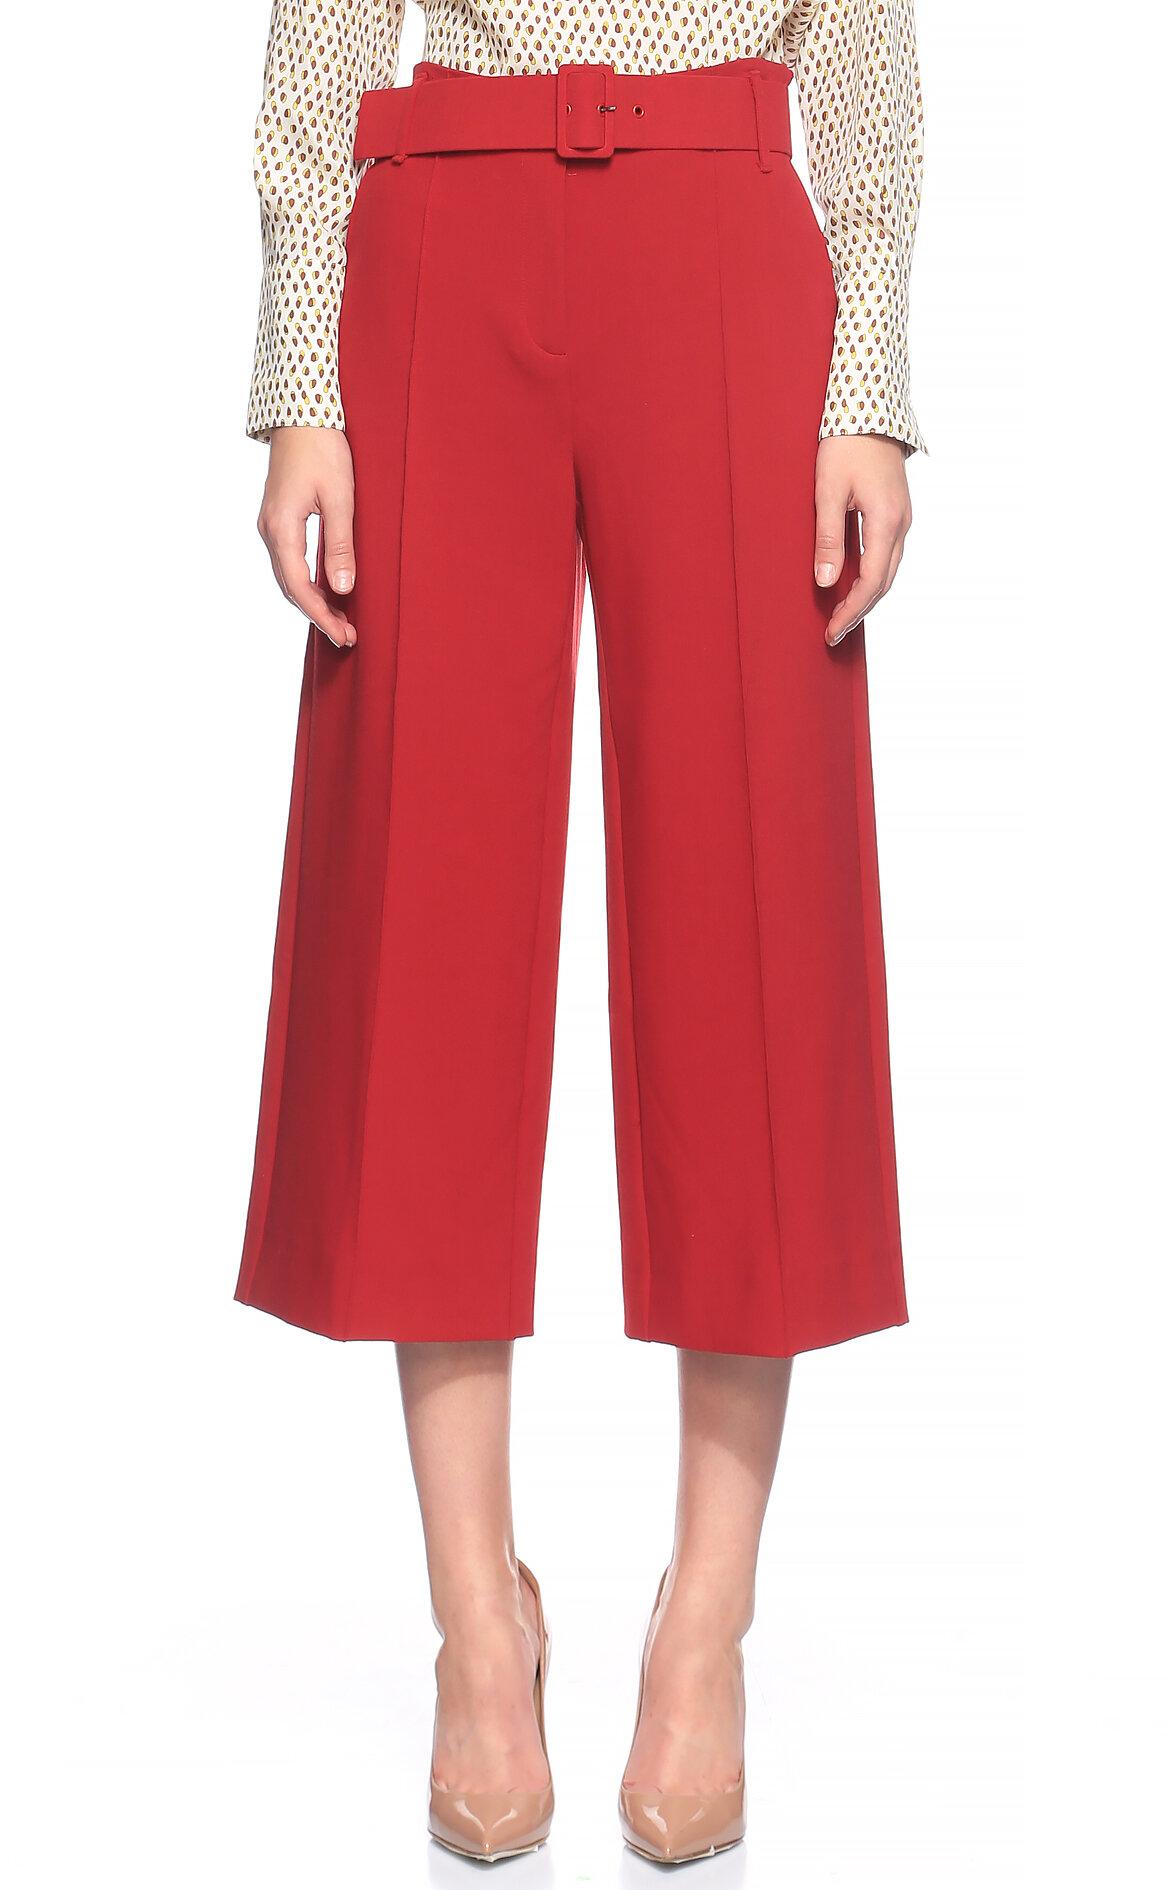 Penny Black-Penny Black Yüksek Belli Kırmızı Pantolon